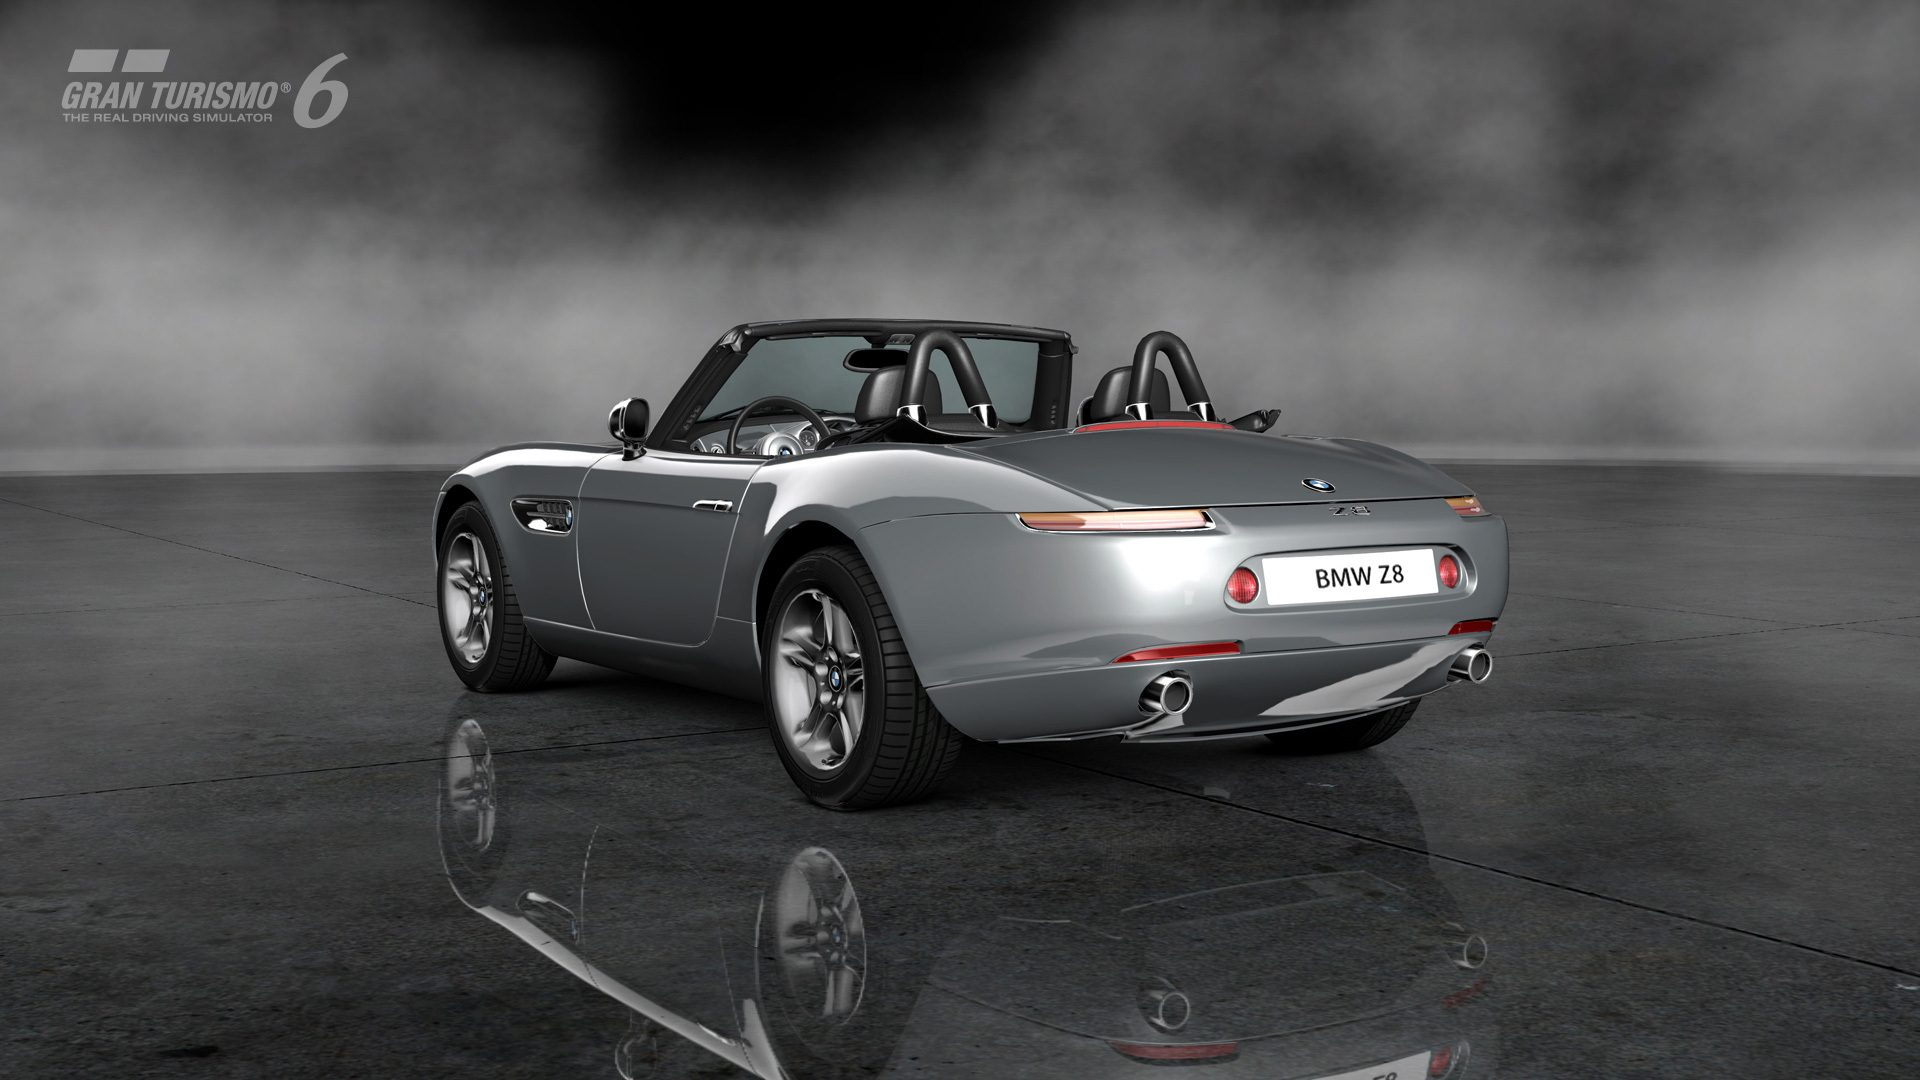 179 gran turismo 6 screenshots cars cars cars. Black Bedroom Furniture Sets. Home Design Ideas